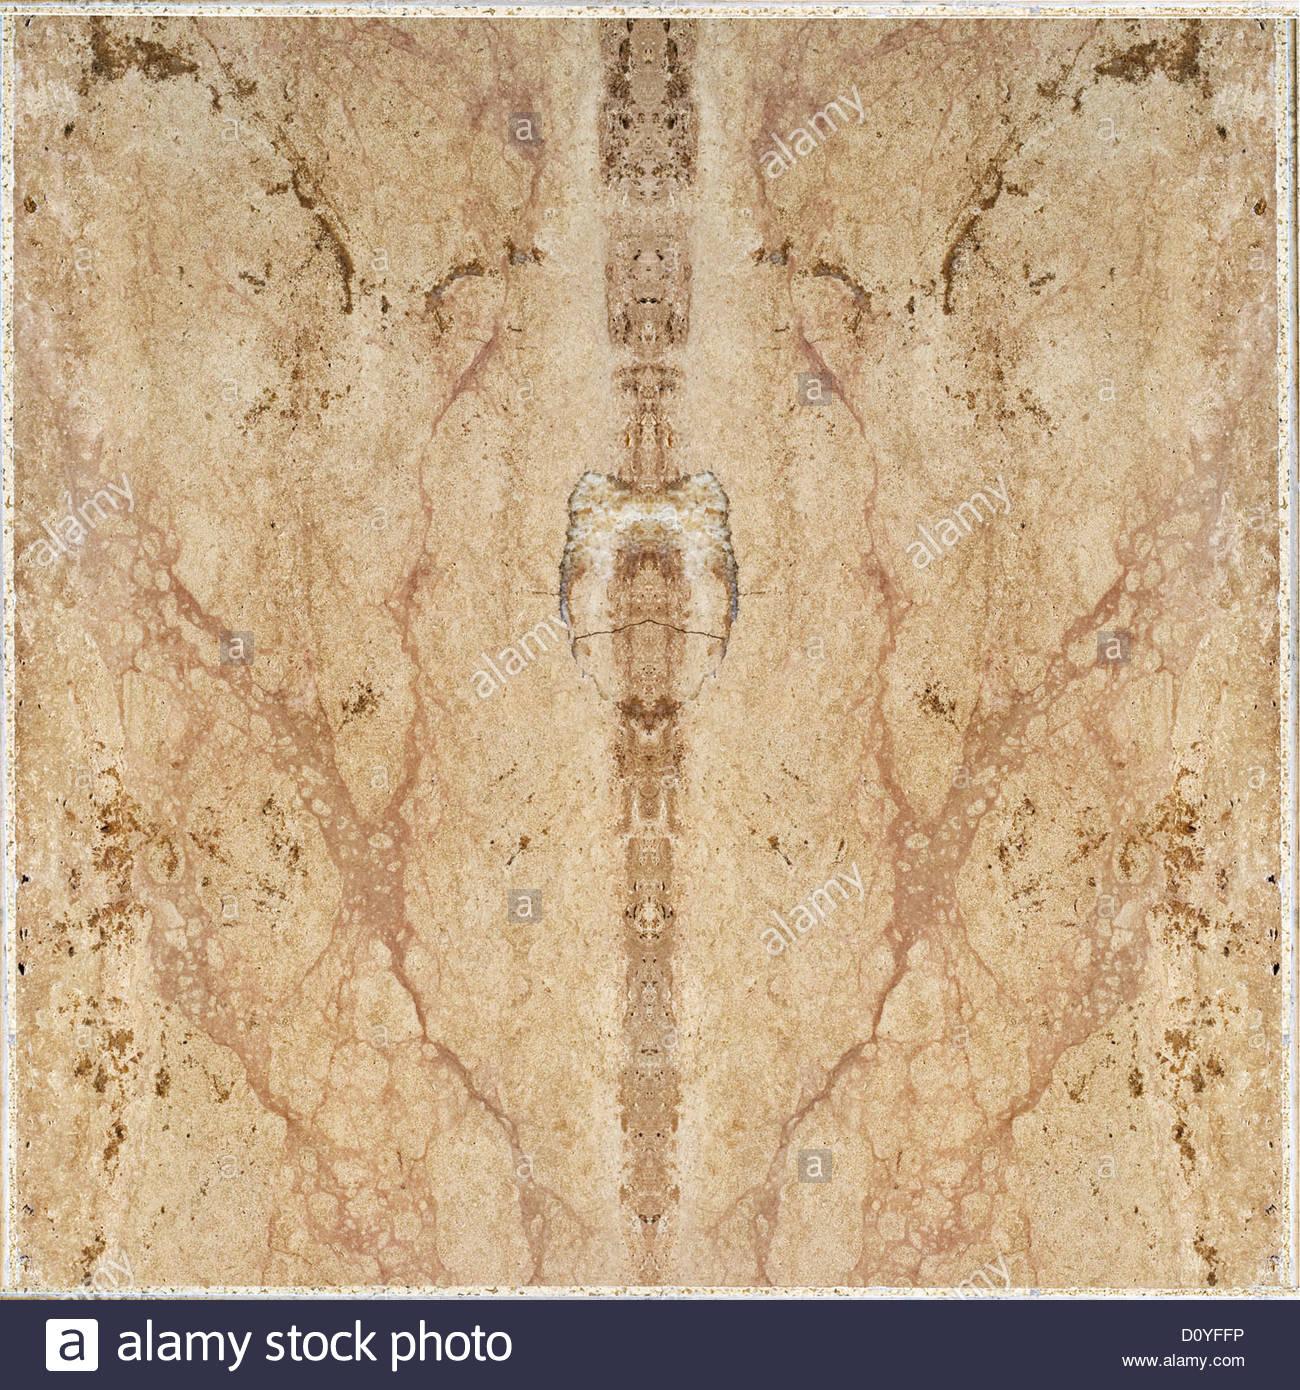 Brown ceramic floor tiles wall texture - Stock Image